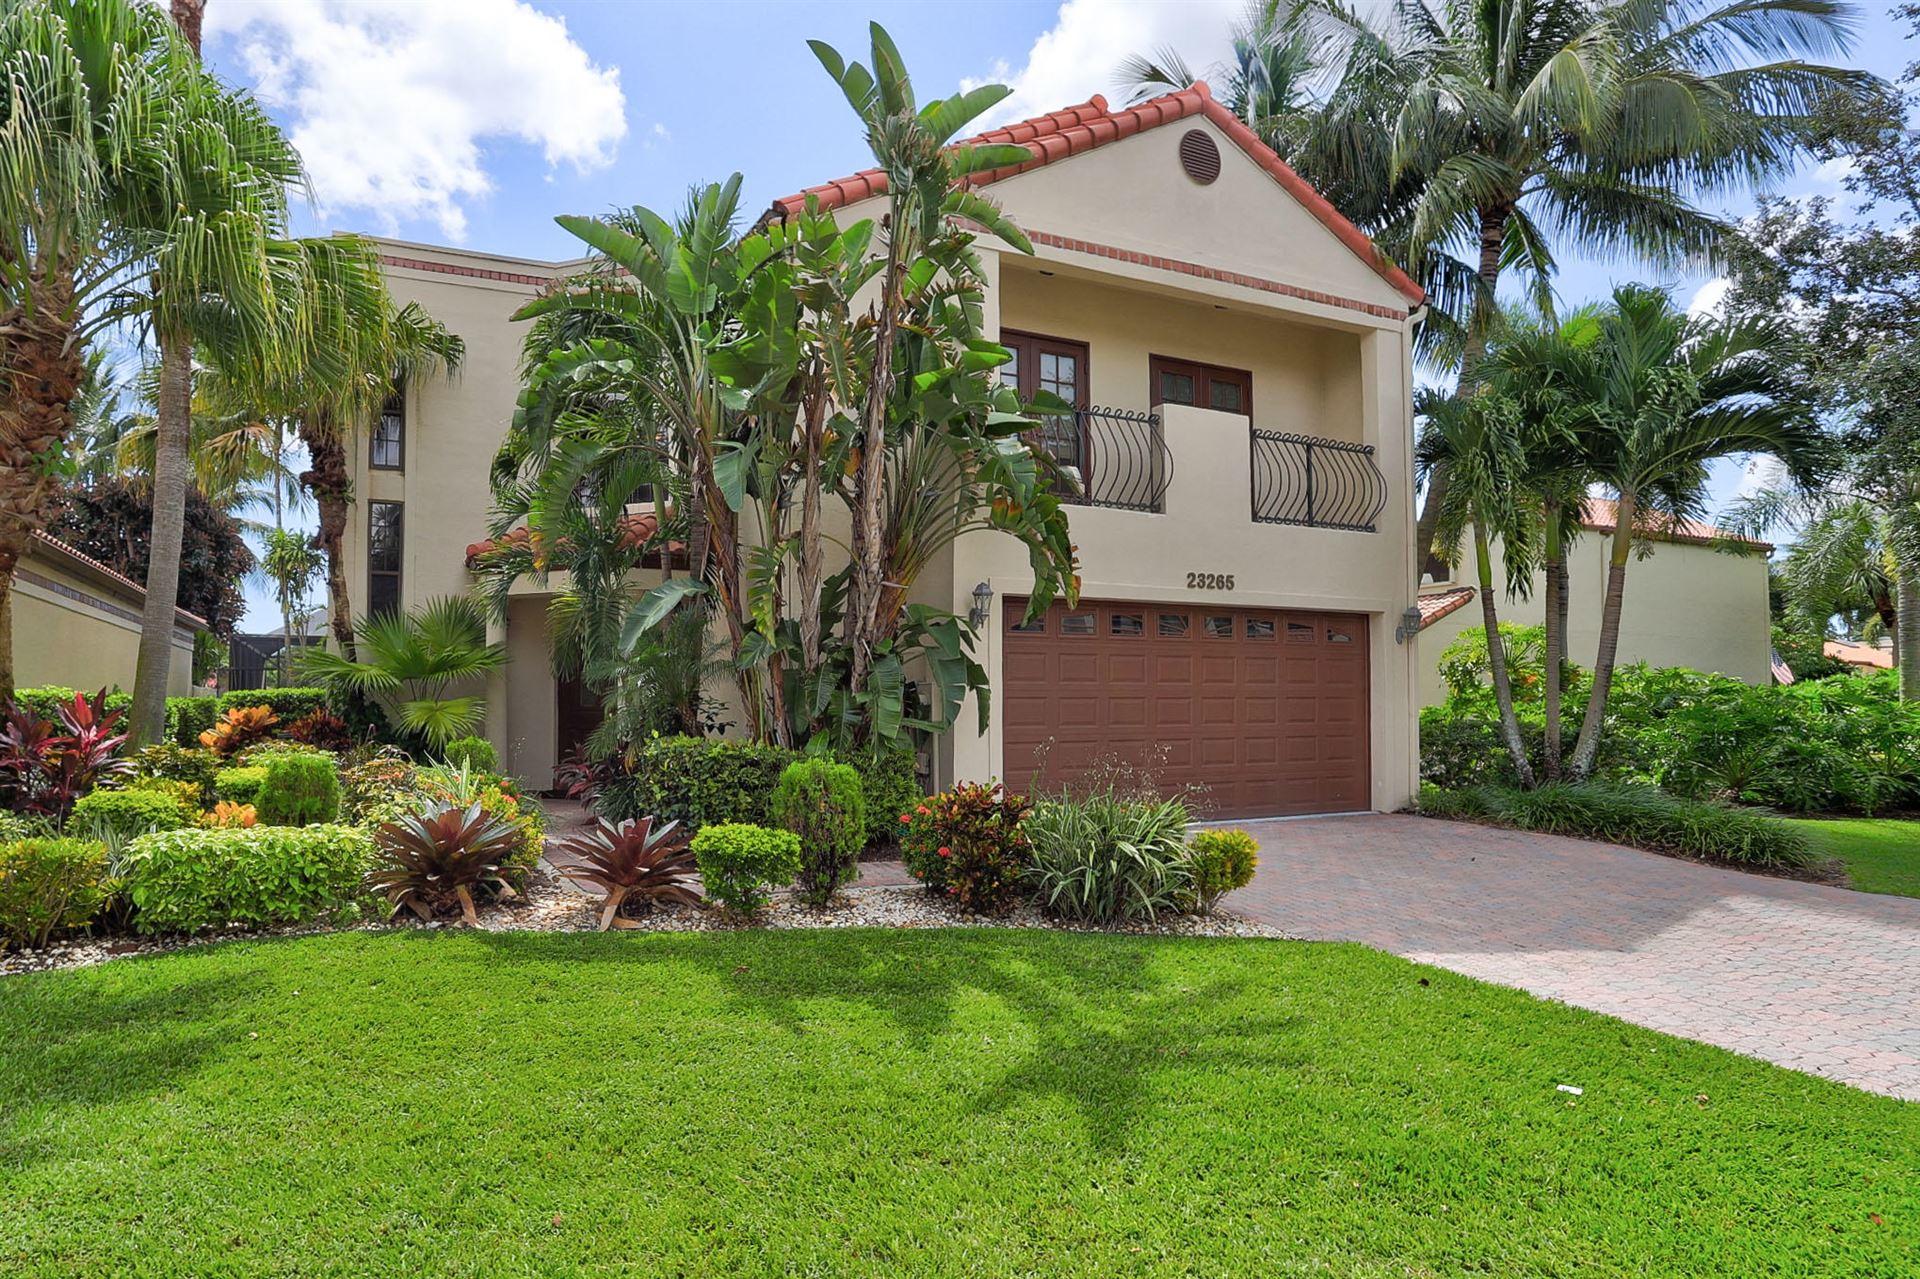 23265 Mirabella Circle N, Boca Raton, FL 33433 - #: RX-10645374